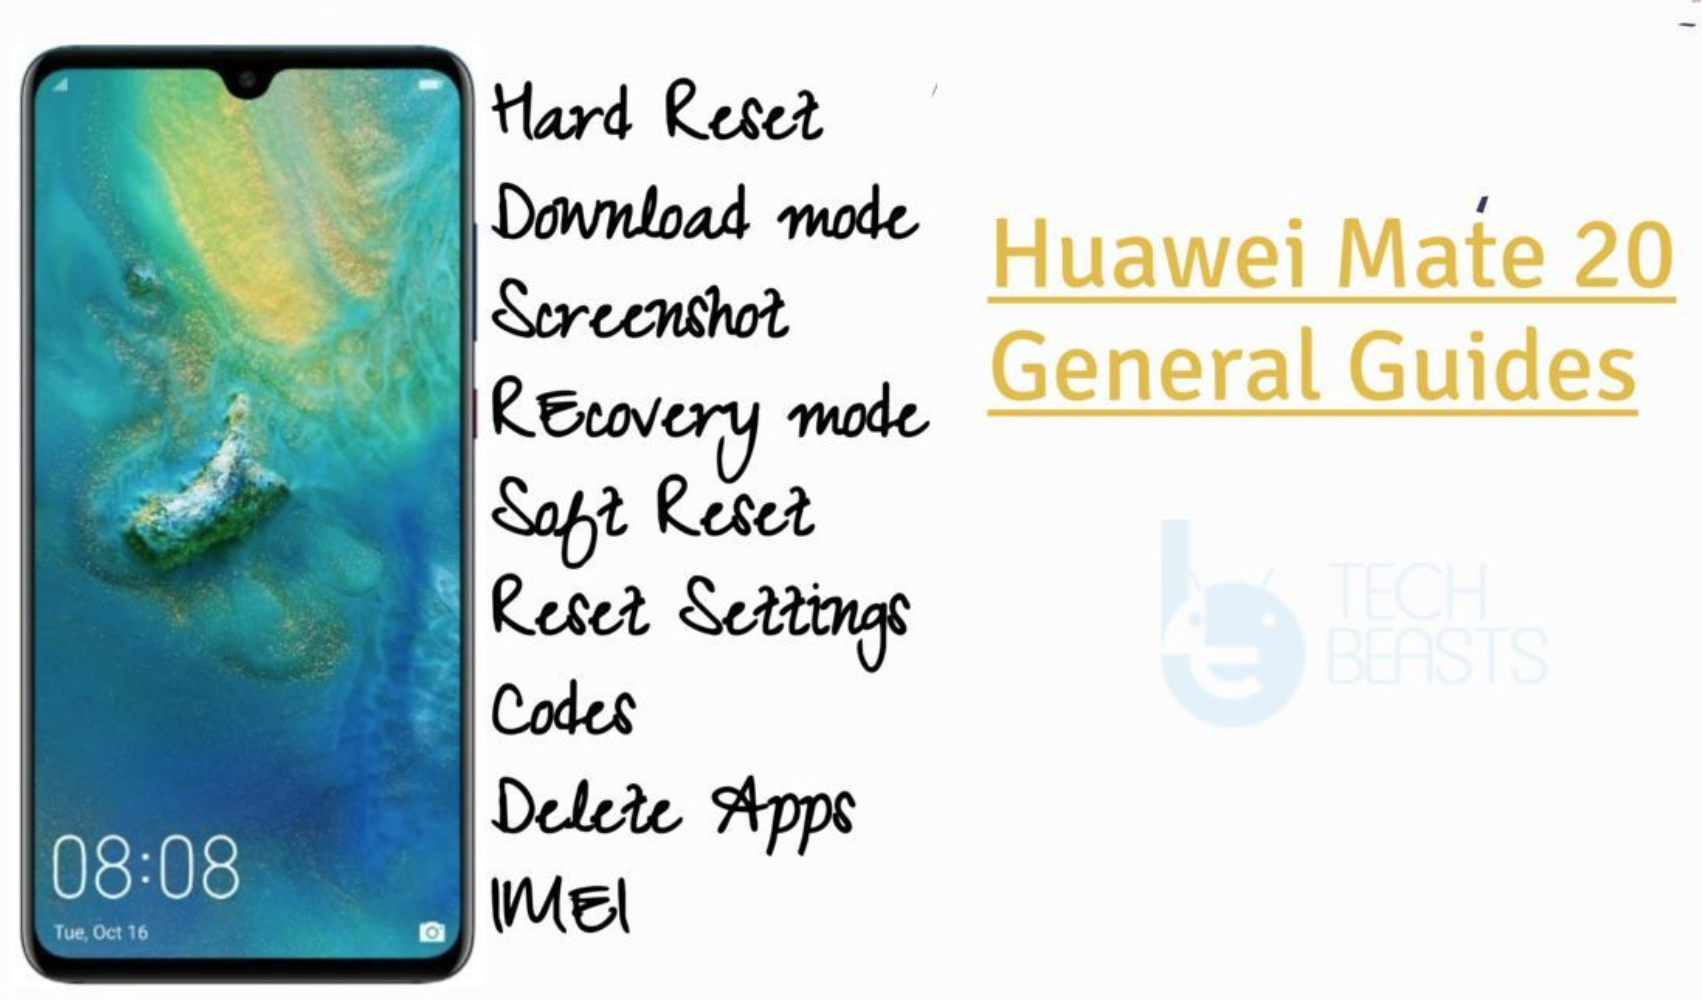 Huawei Mate 20 Guides